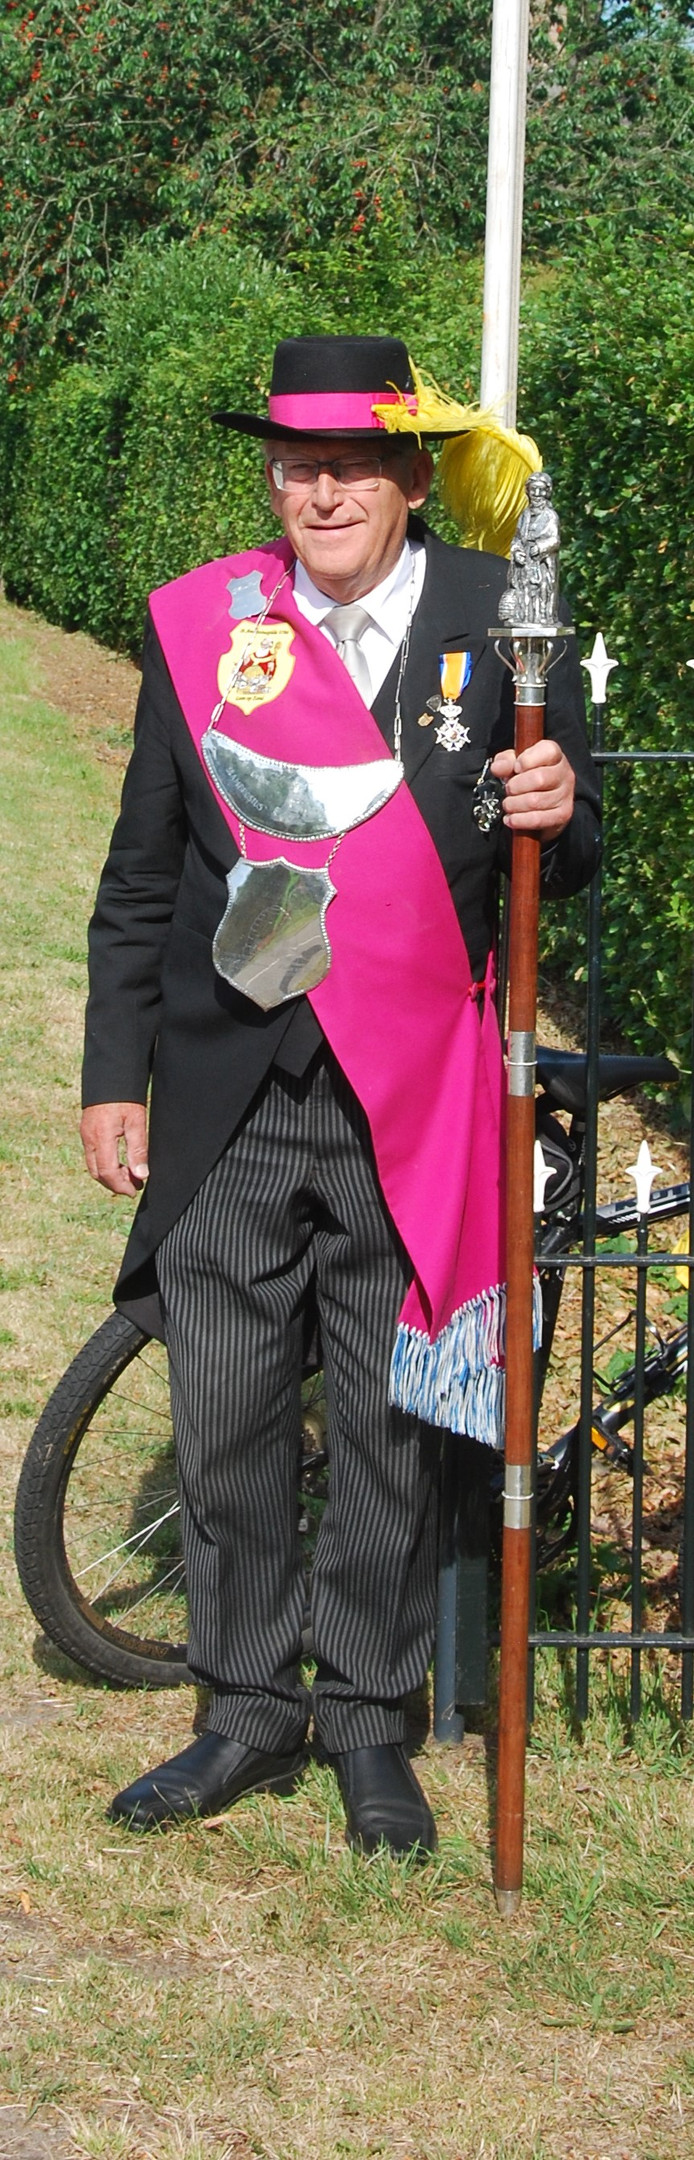 Hoofdman Jan van Riel